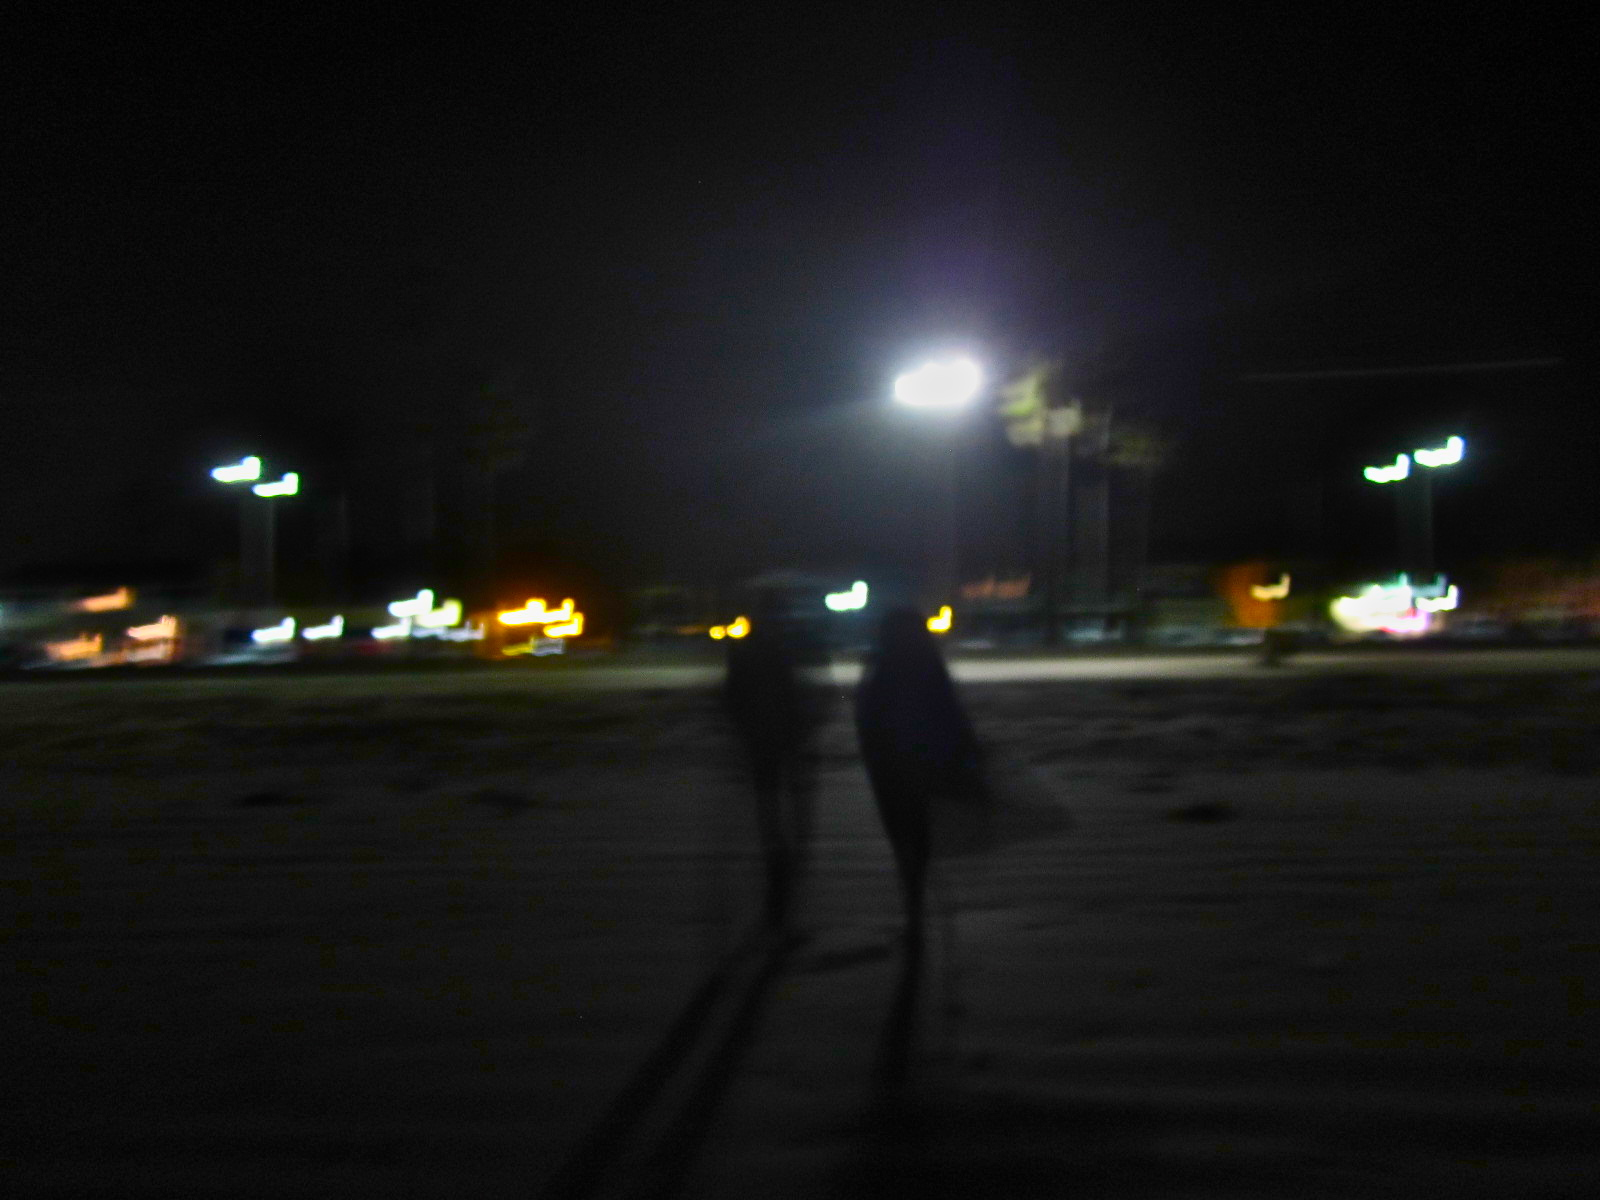 5 Reasons Why I Love The Beach At Night